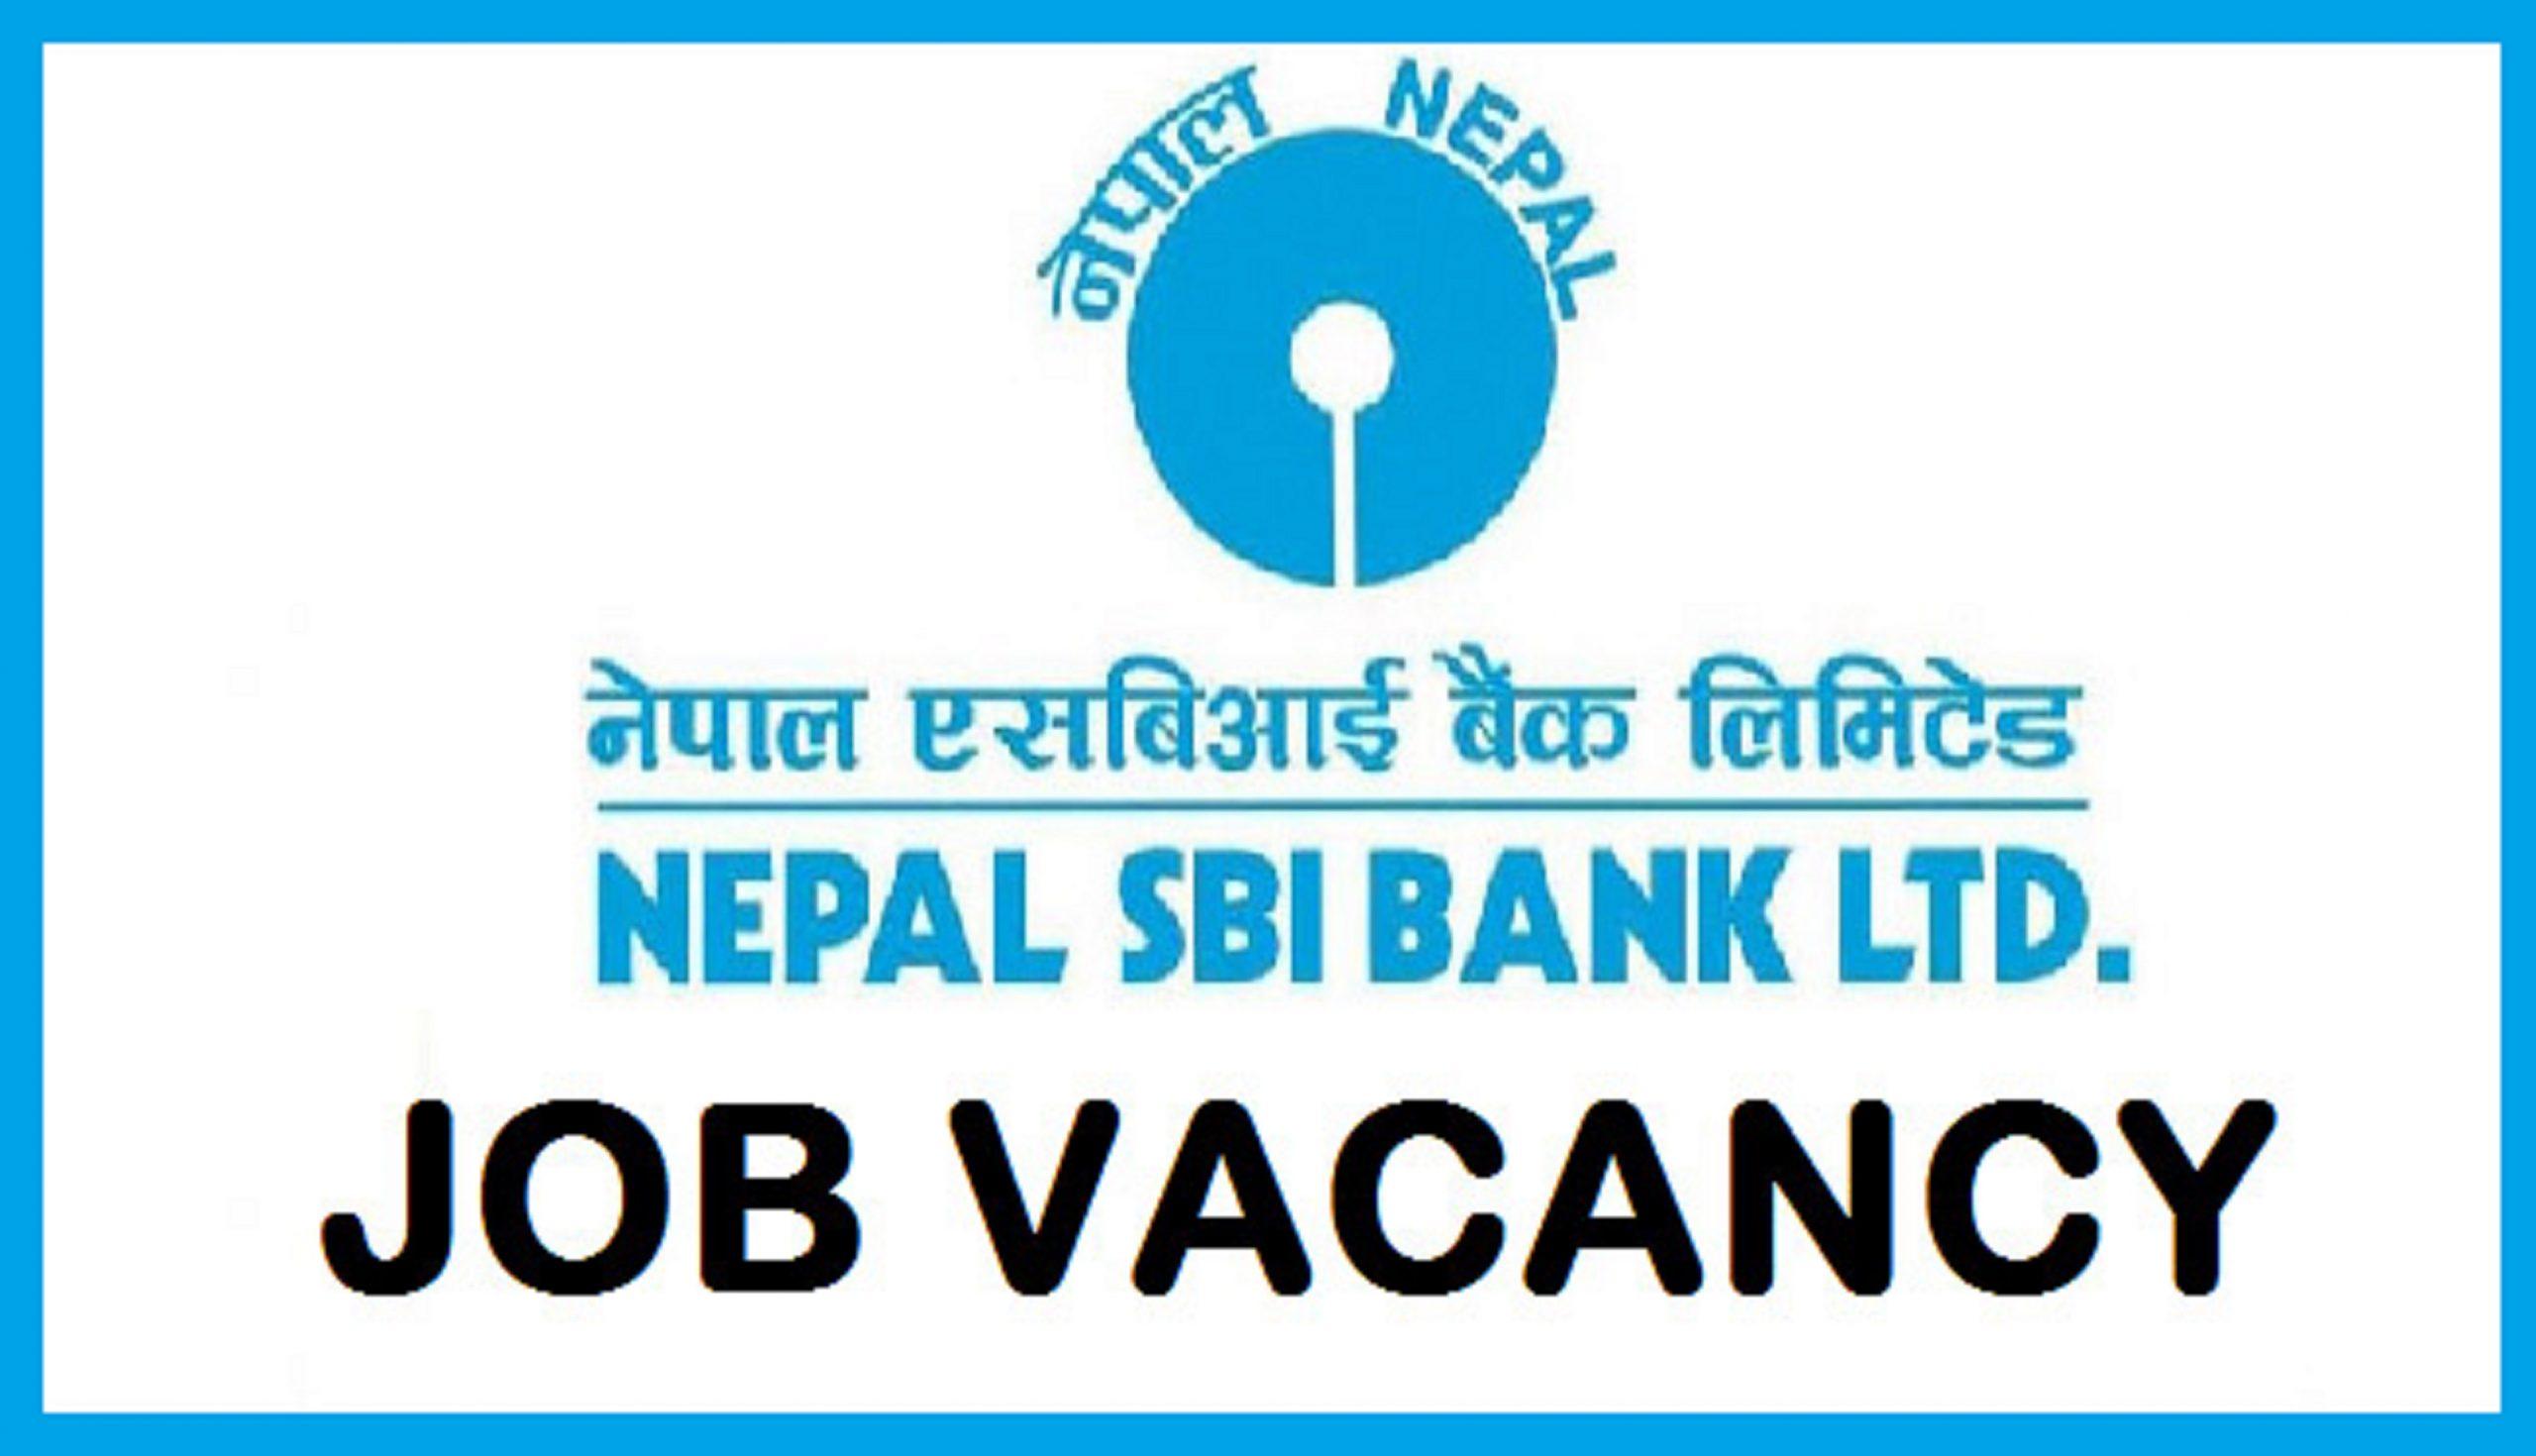 Nepal SBI Bank Job Vacancy